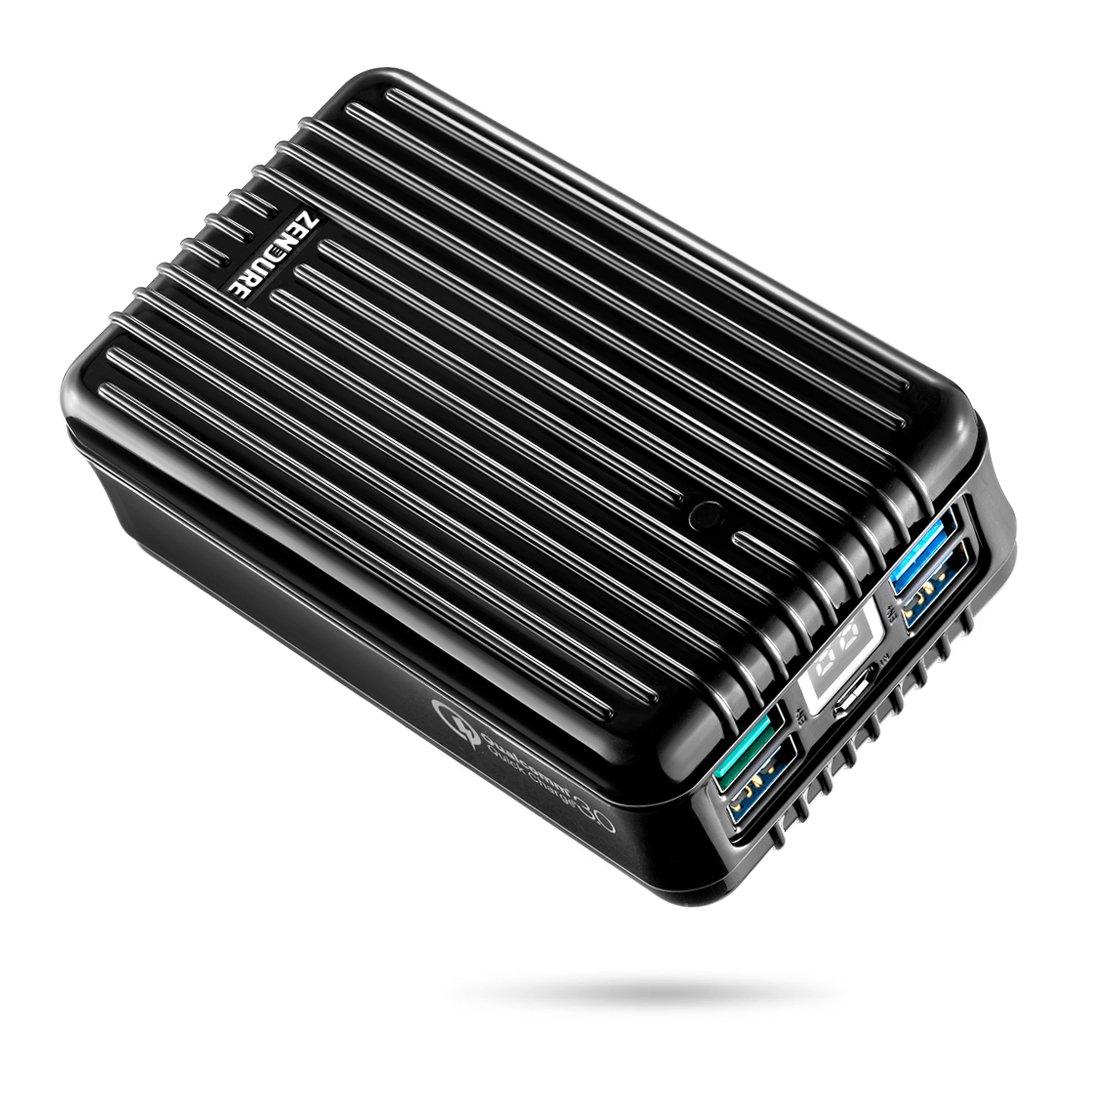 Zendure A8QC 26800mAh Powerbank Externer Akku, Akkupack mit Qualcomm Quick Charge 3.0, kompakter Zusatzakku mit 4-Port und LED Dislay